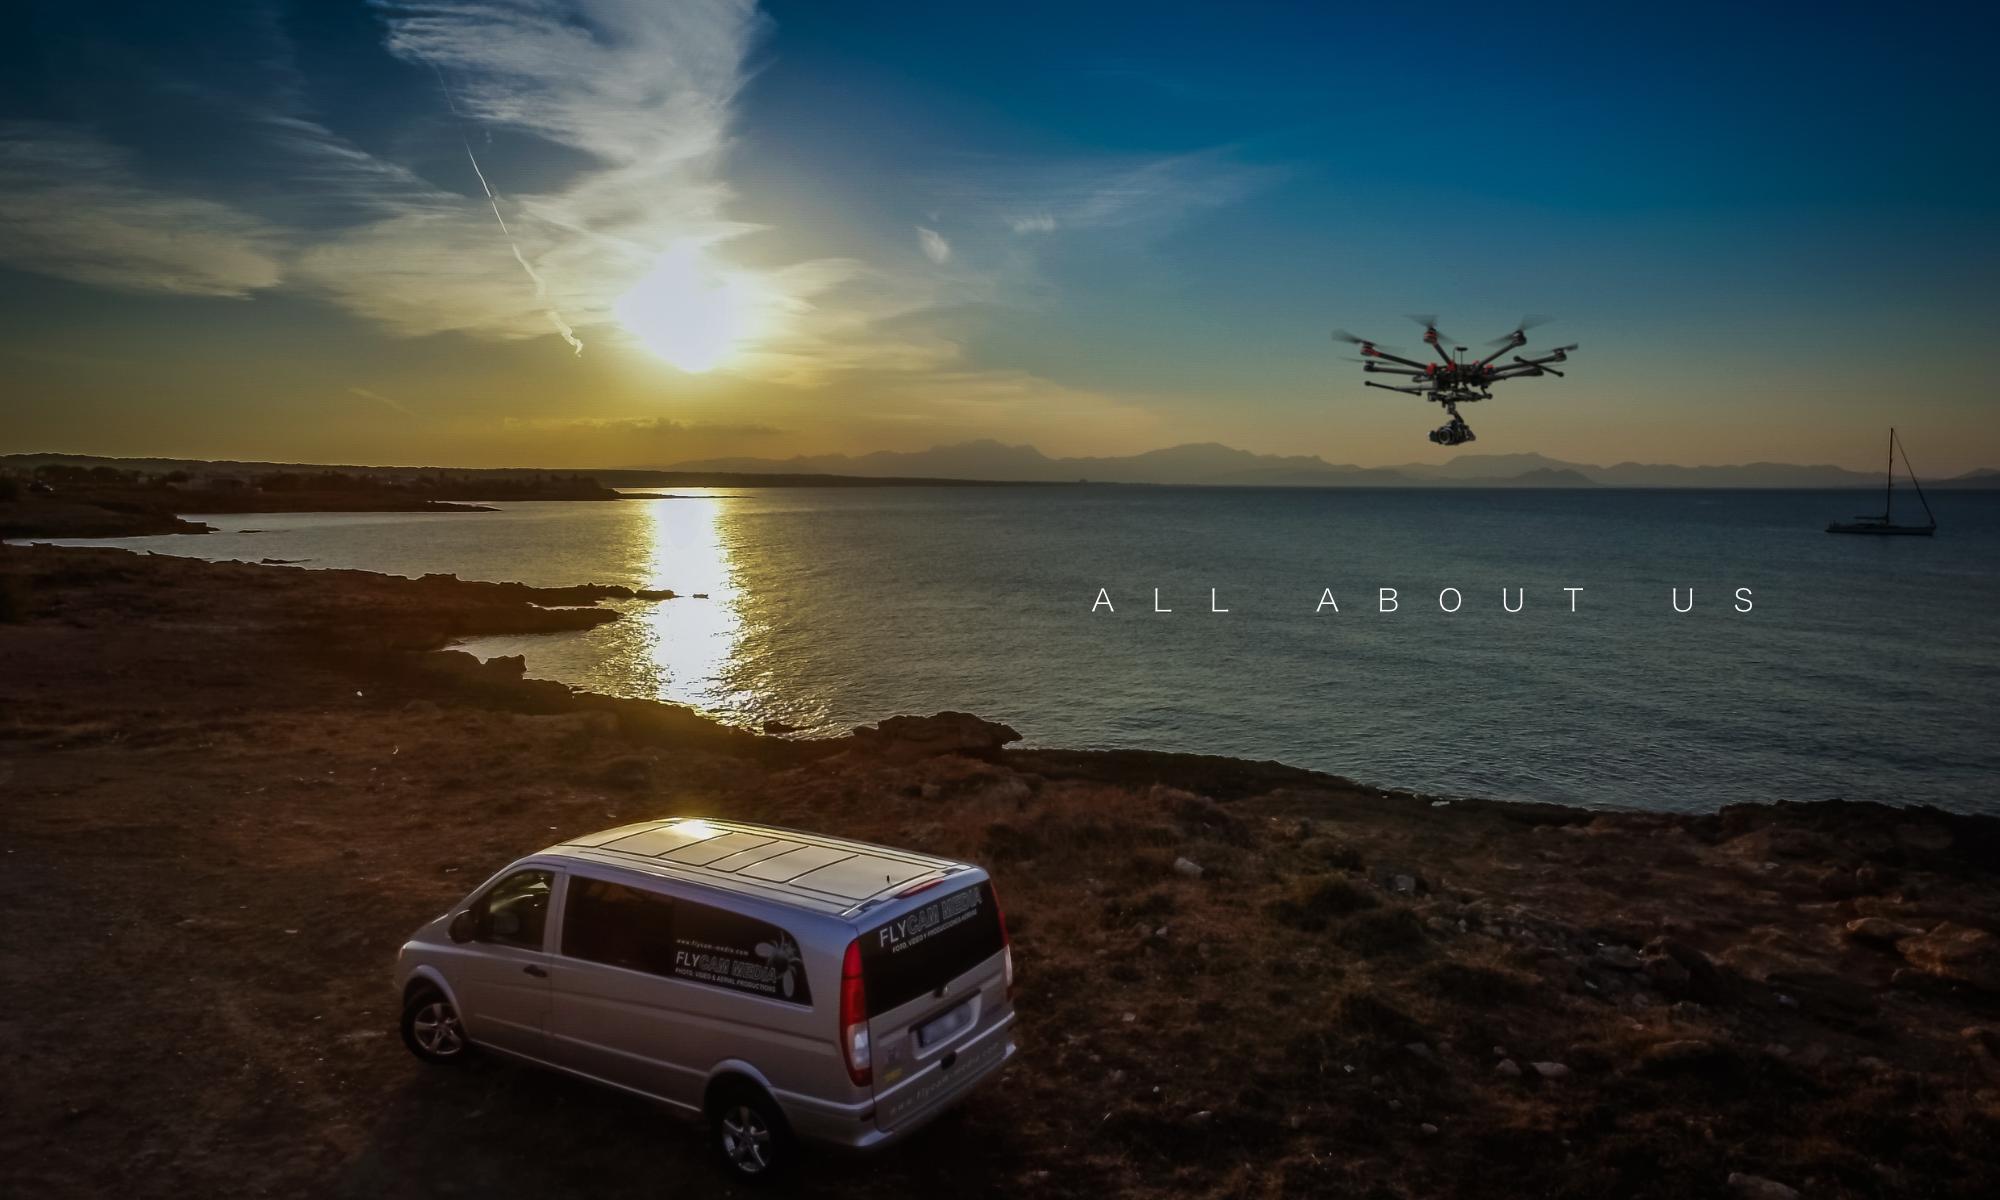 Flycam Media Mallorca Heavylift Multicopter Drohnen Services Filmproduktion, Fotograf DJI M600